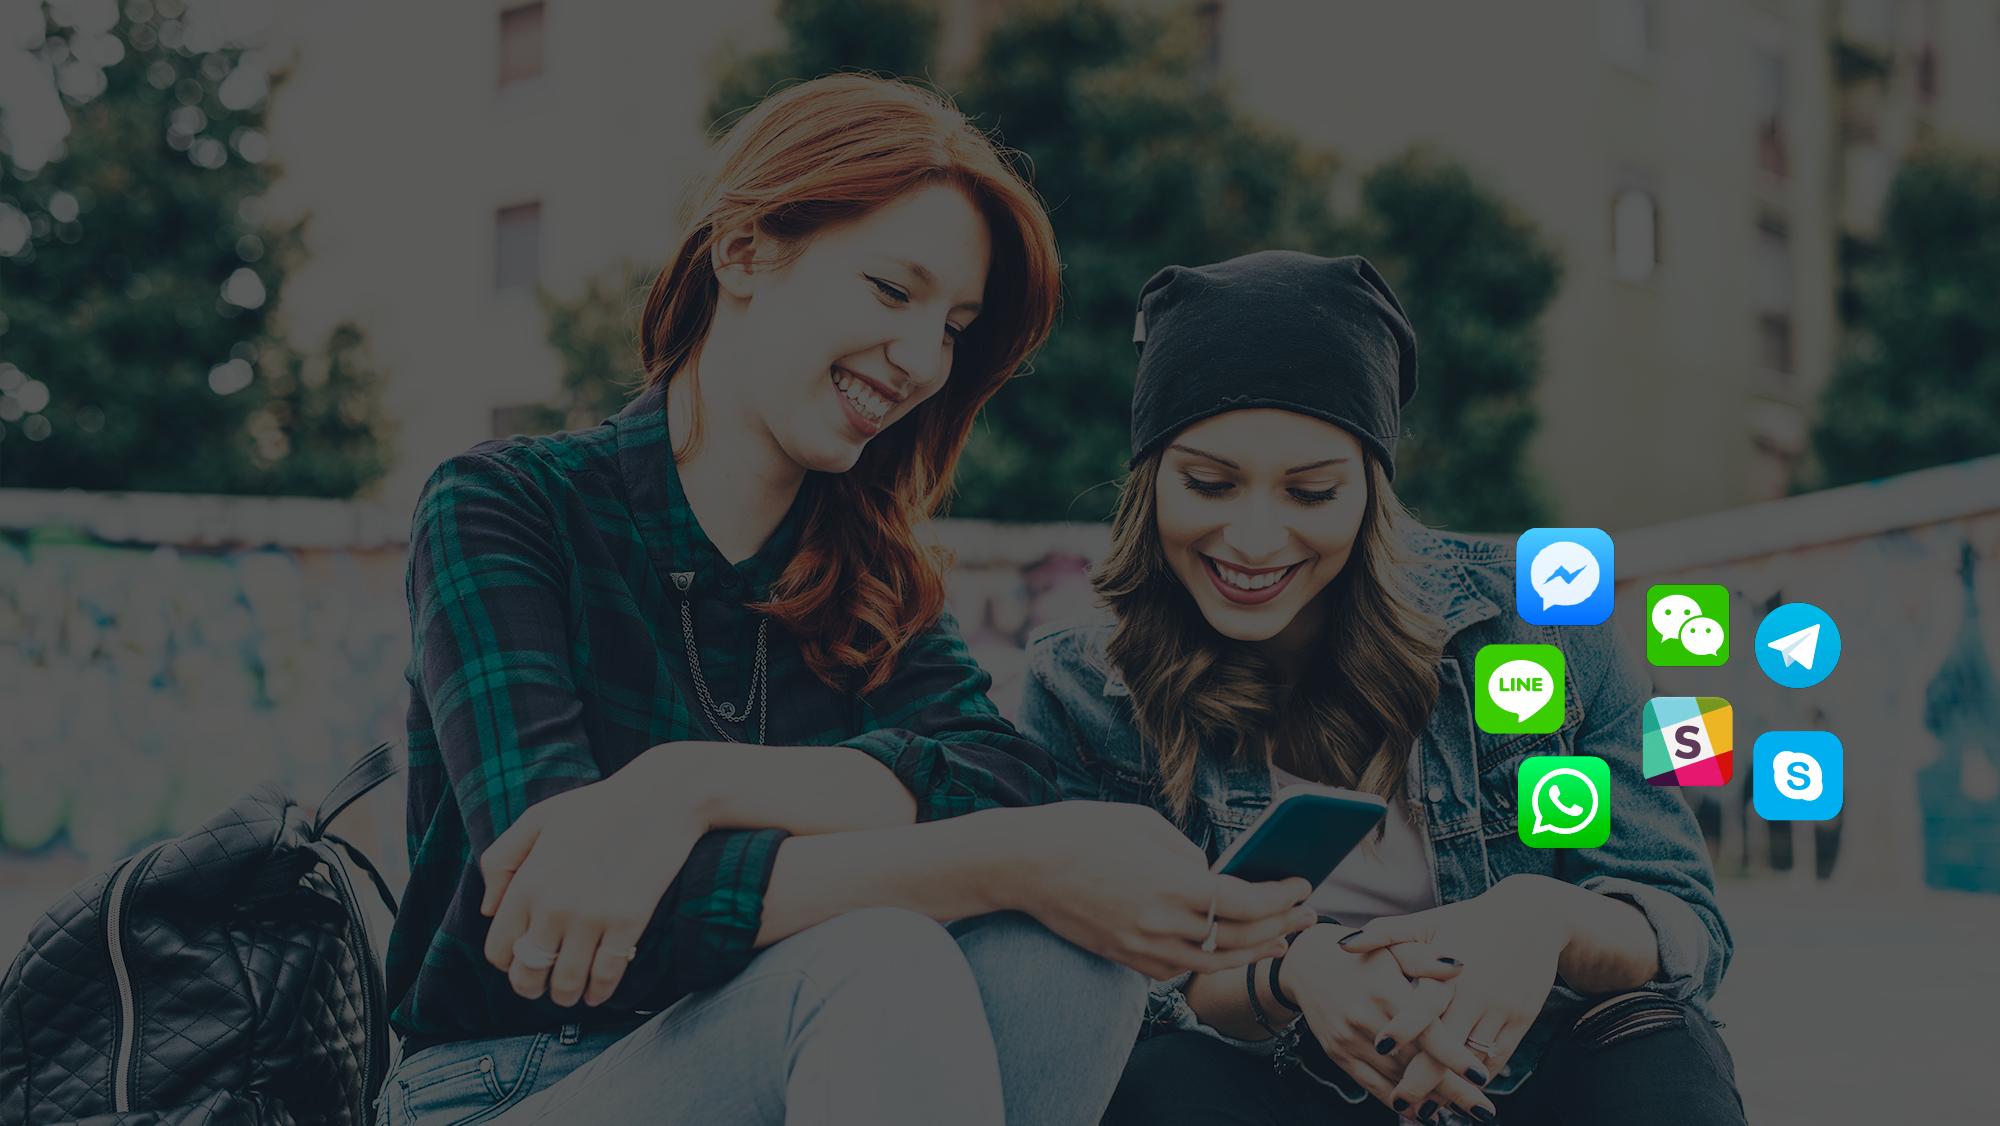 Easychat facebook cover 2019_plain